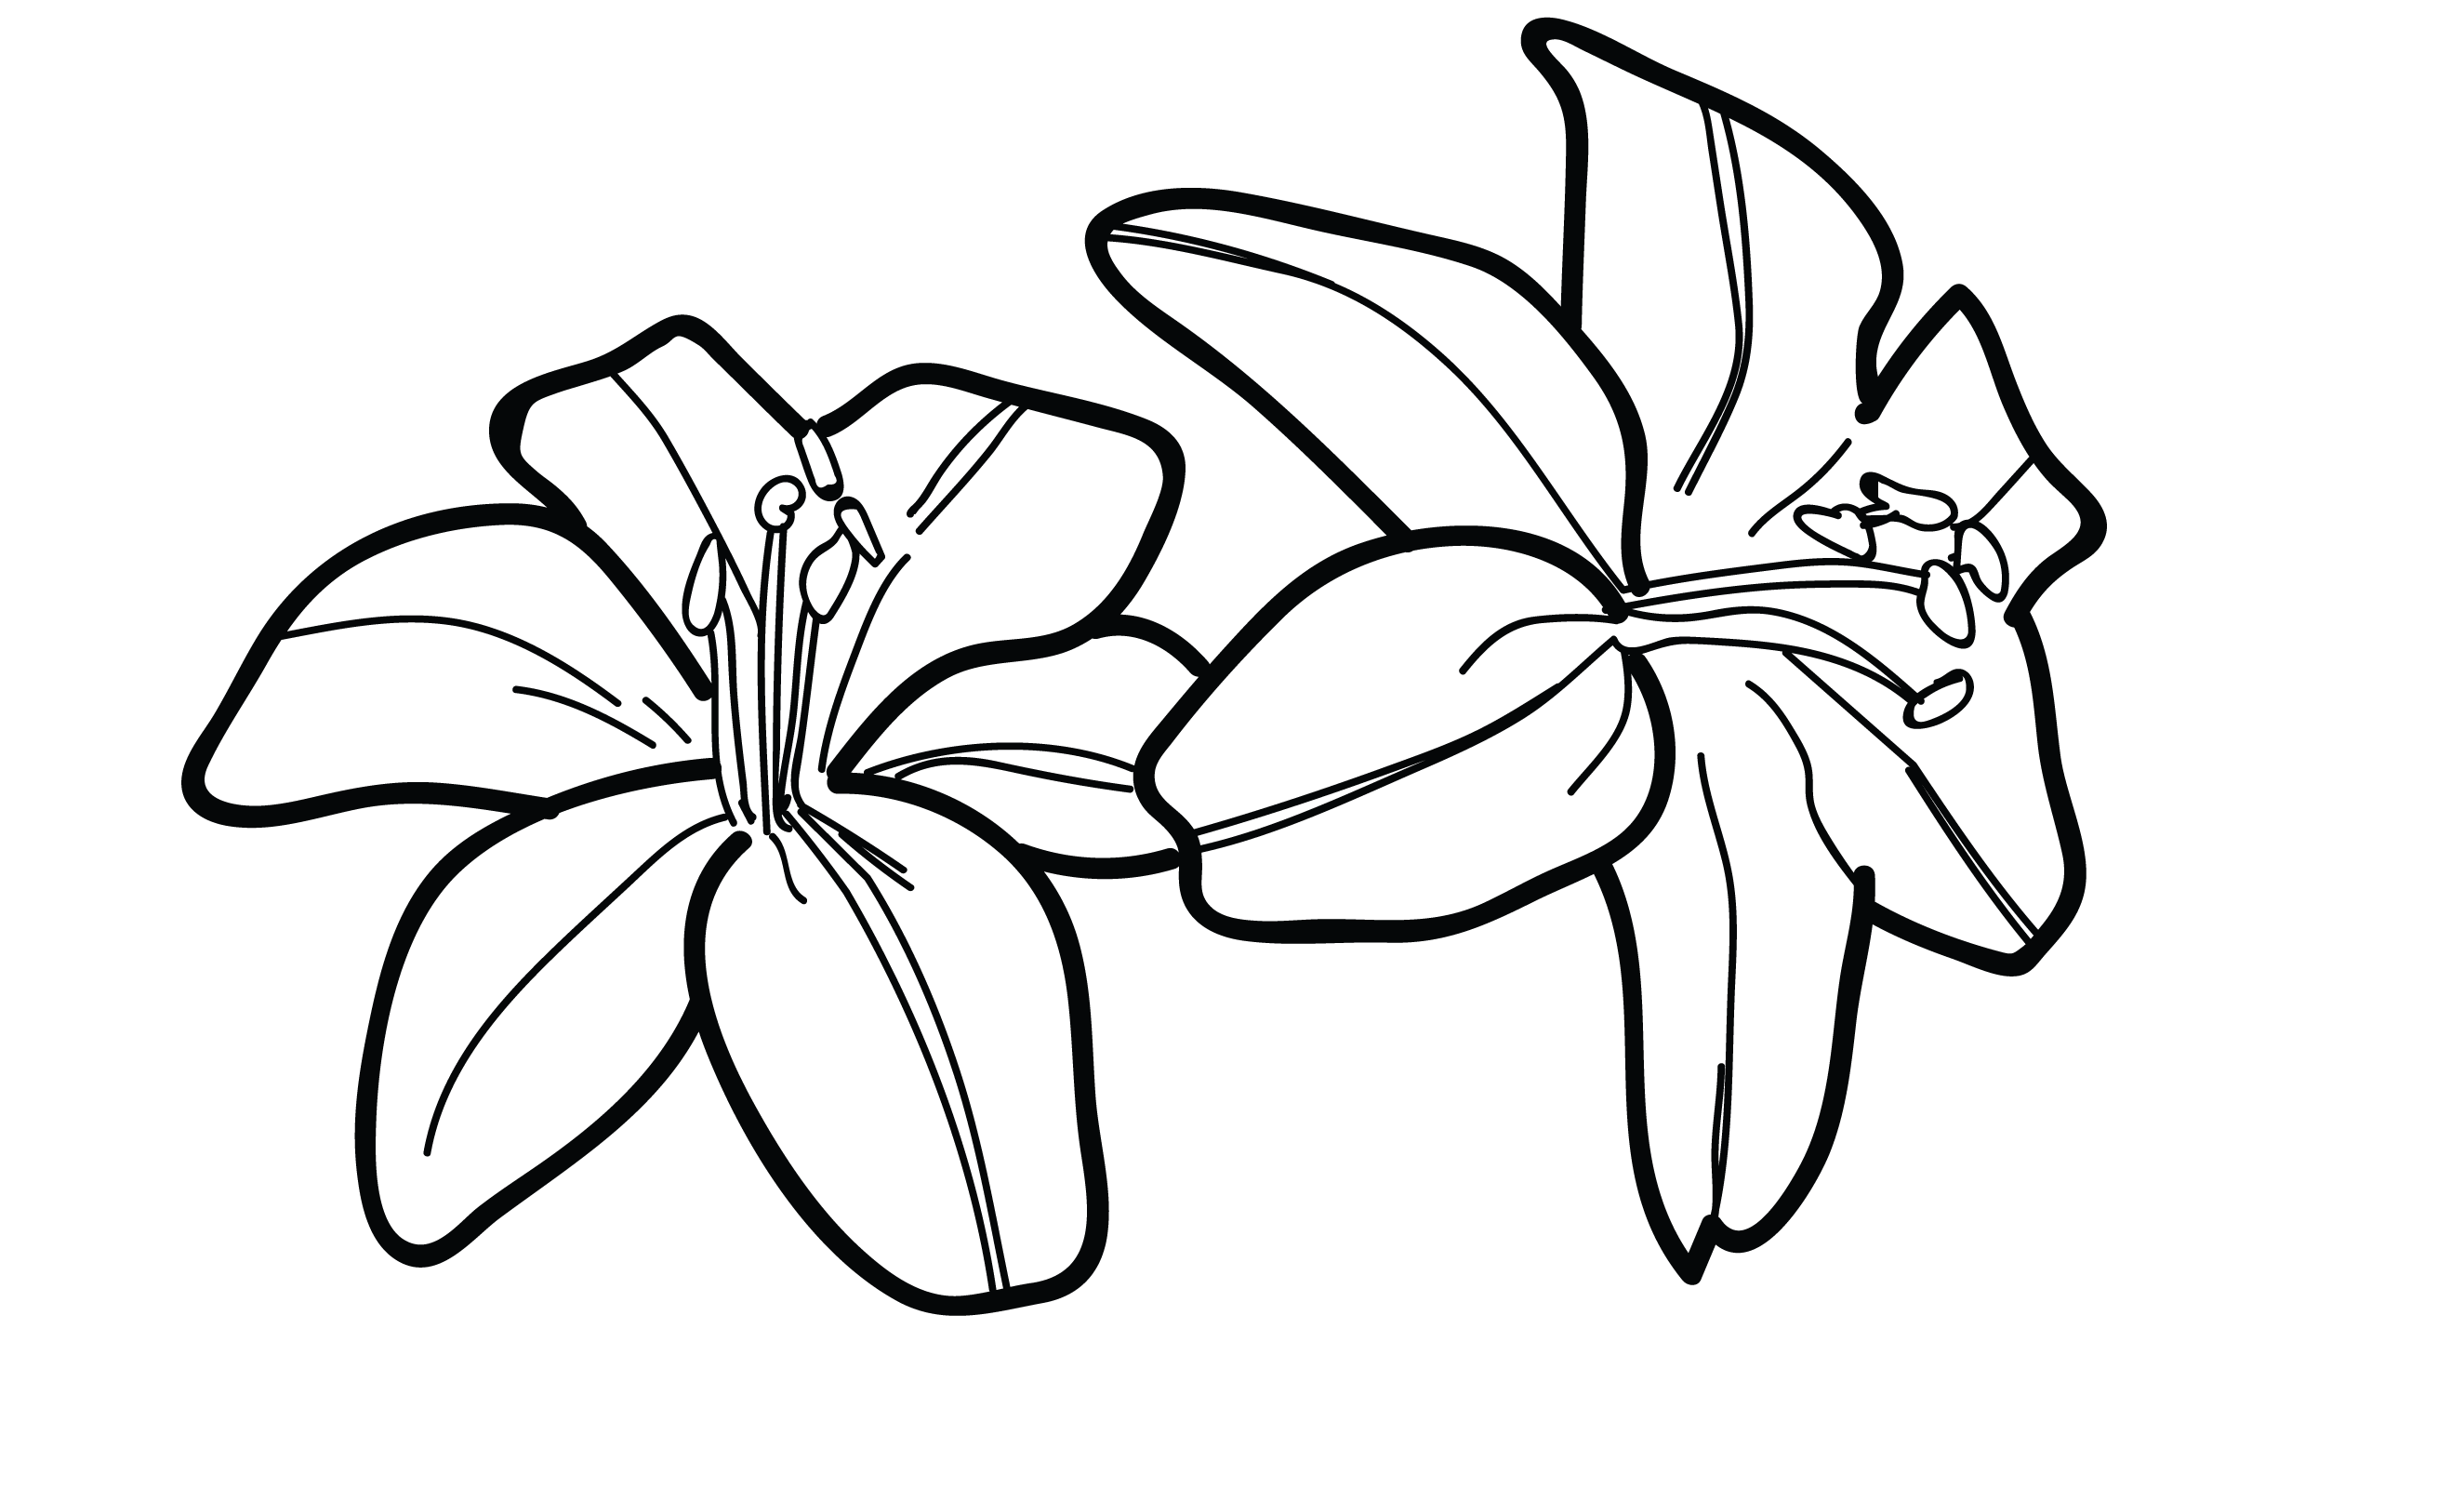 lily sketch how to draw a stargazer lily step by step flowers pop sketch lily